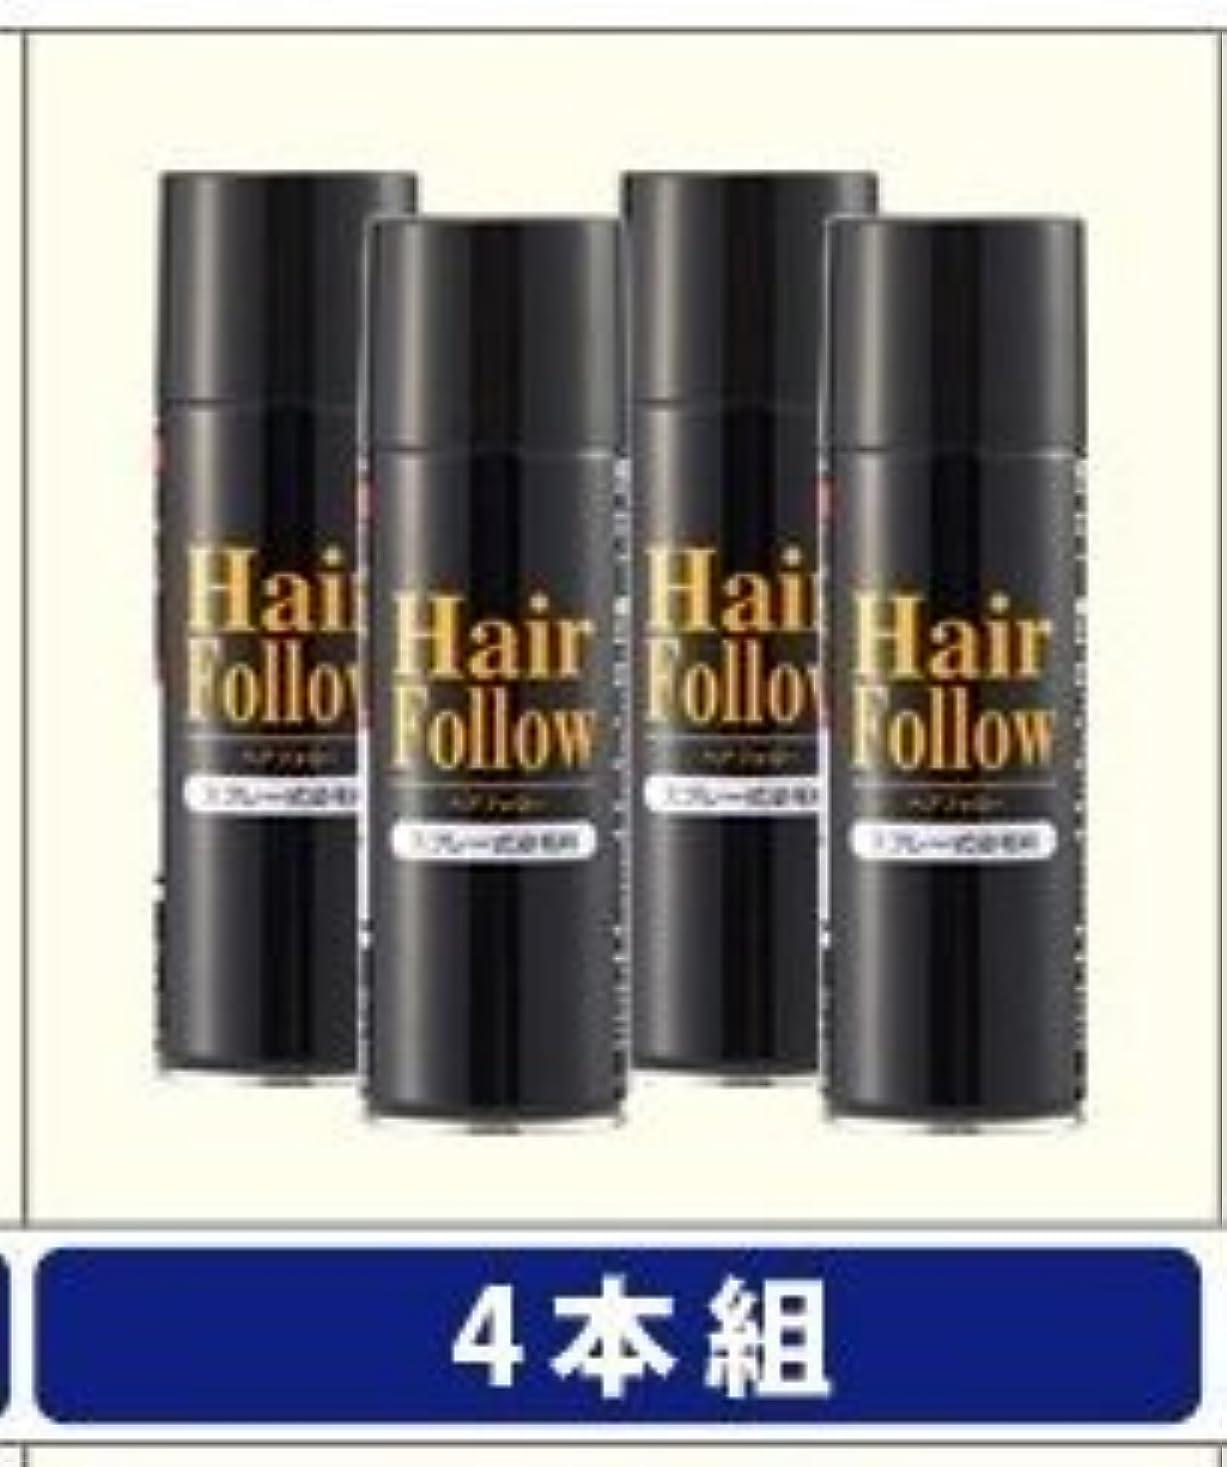 NEW ヘアフォロー スプレー ブラウン スプレー式染毛料 自然に薄毛をボリュームアップ!薄毛隠し かつら (4本)